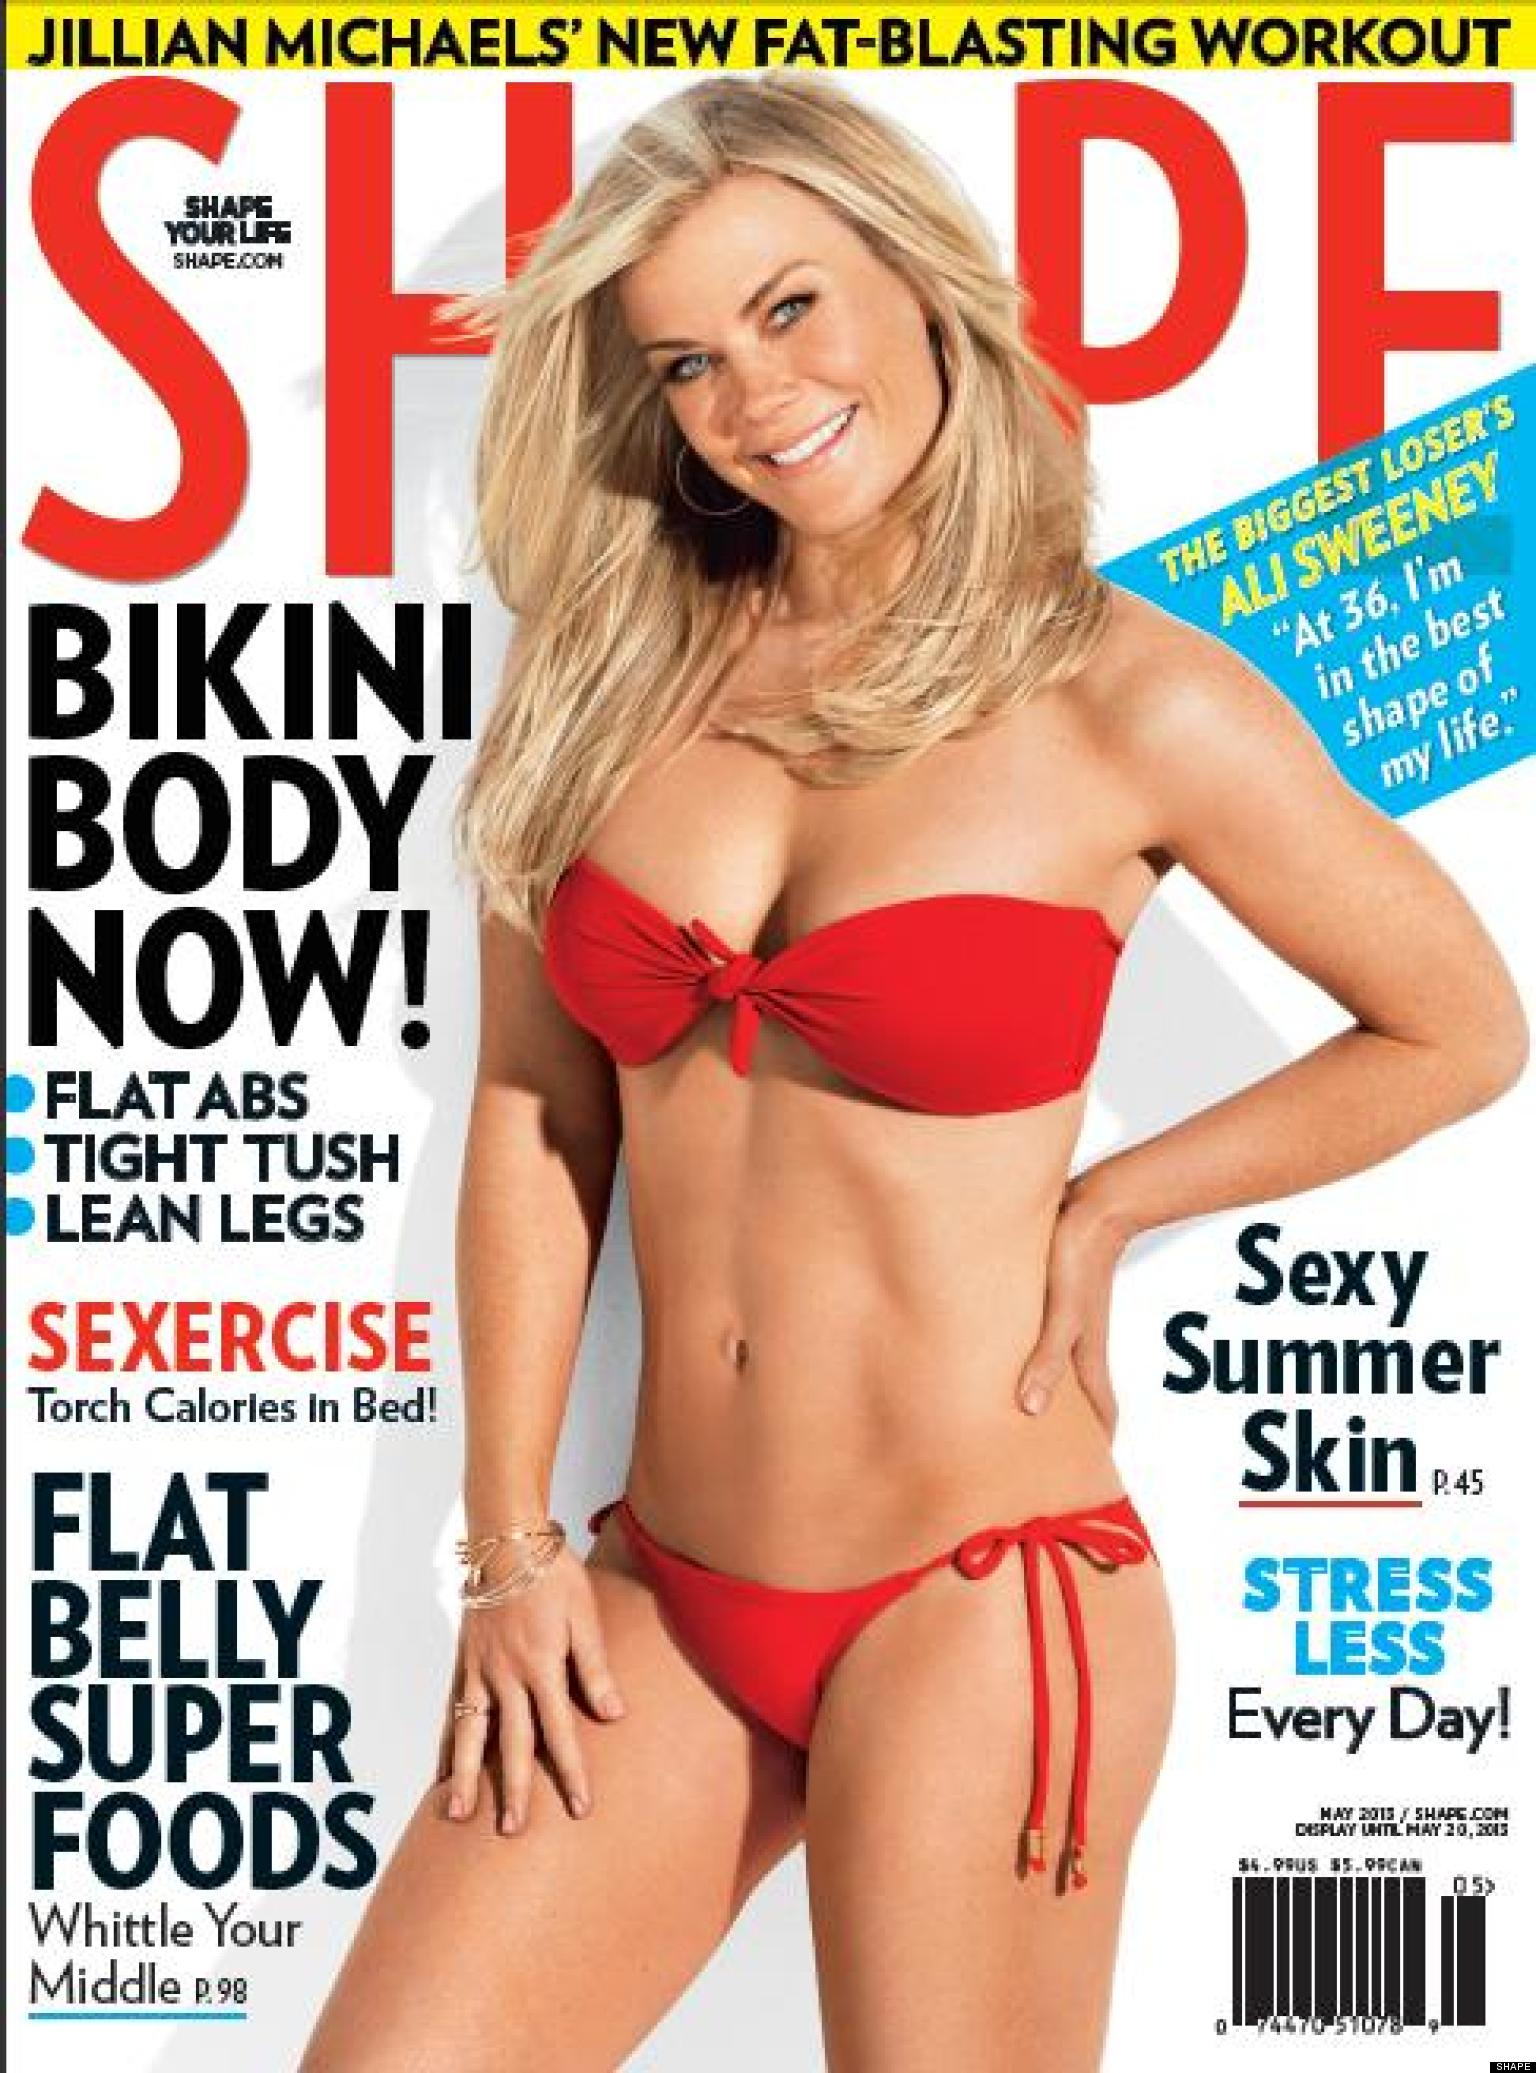 Alison Sweeney Hot: 'The Biggest Loser' Host Shows Off Amazing Bikini Body In Shape Magazine | HuffPost